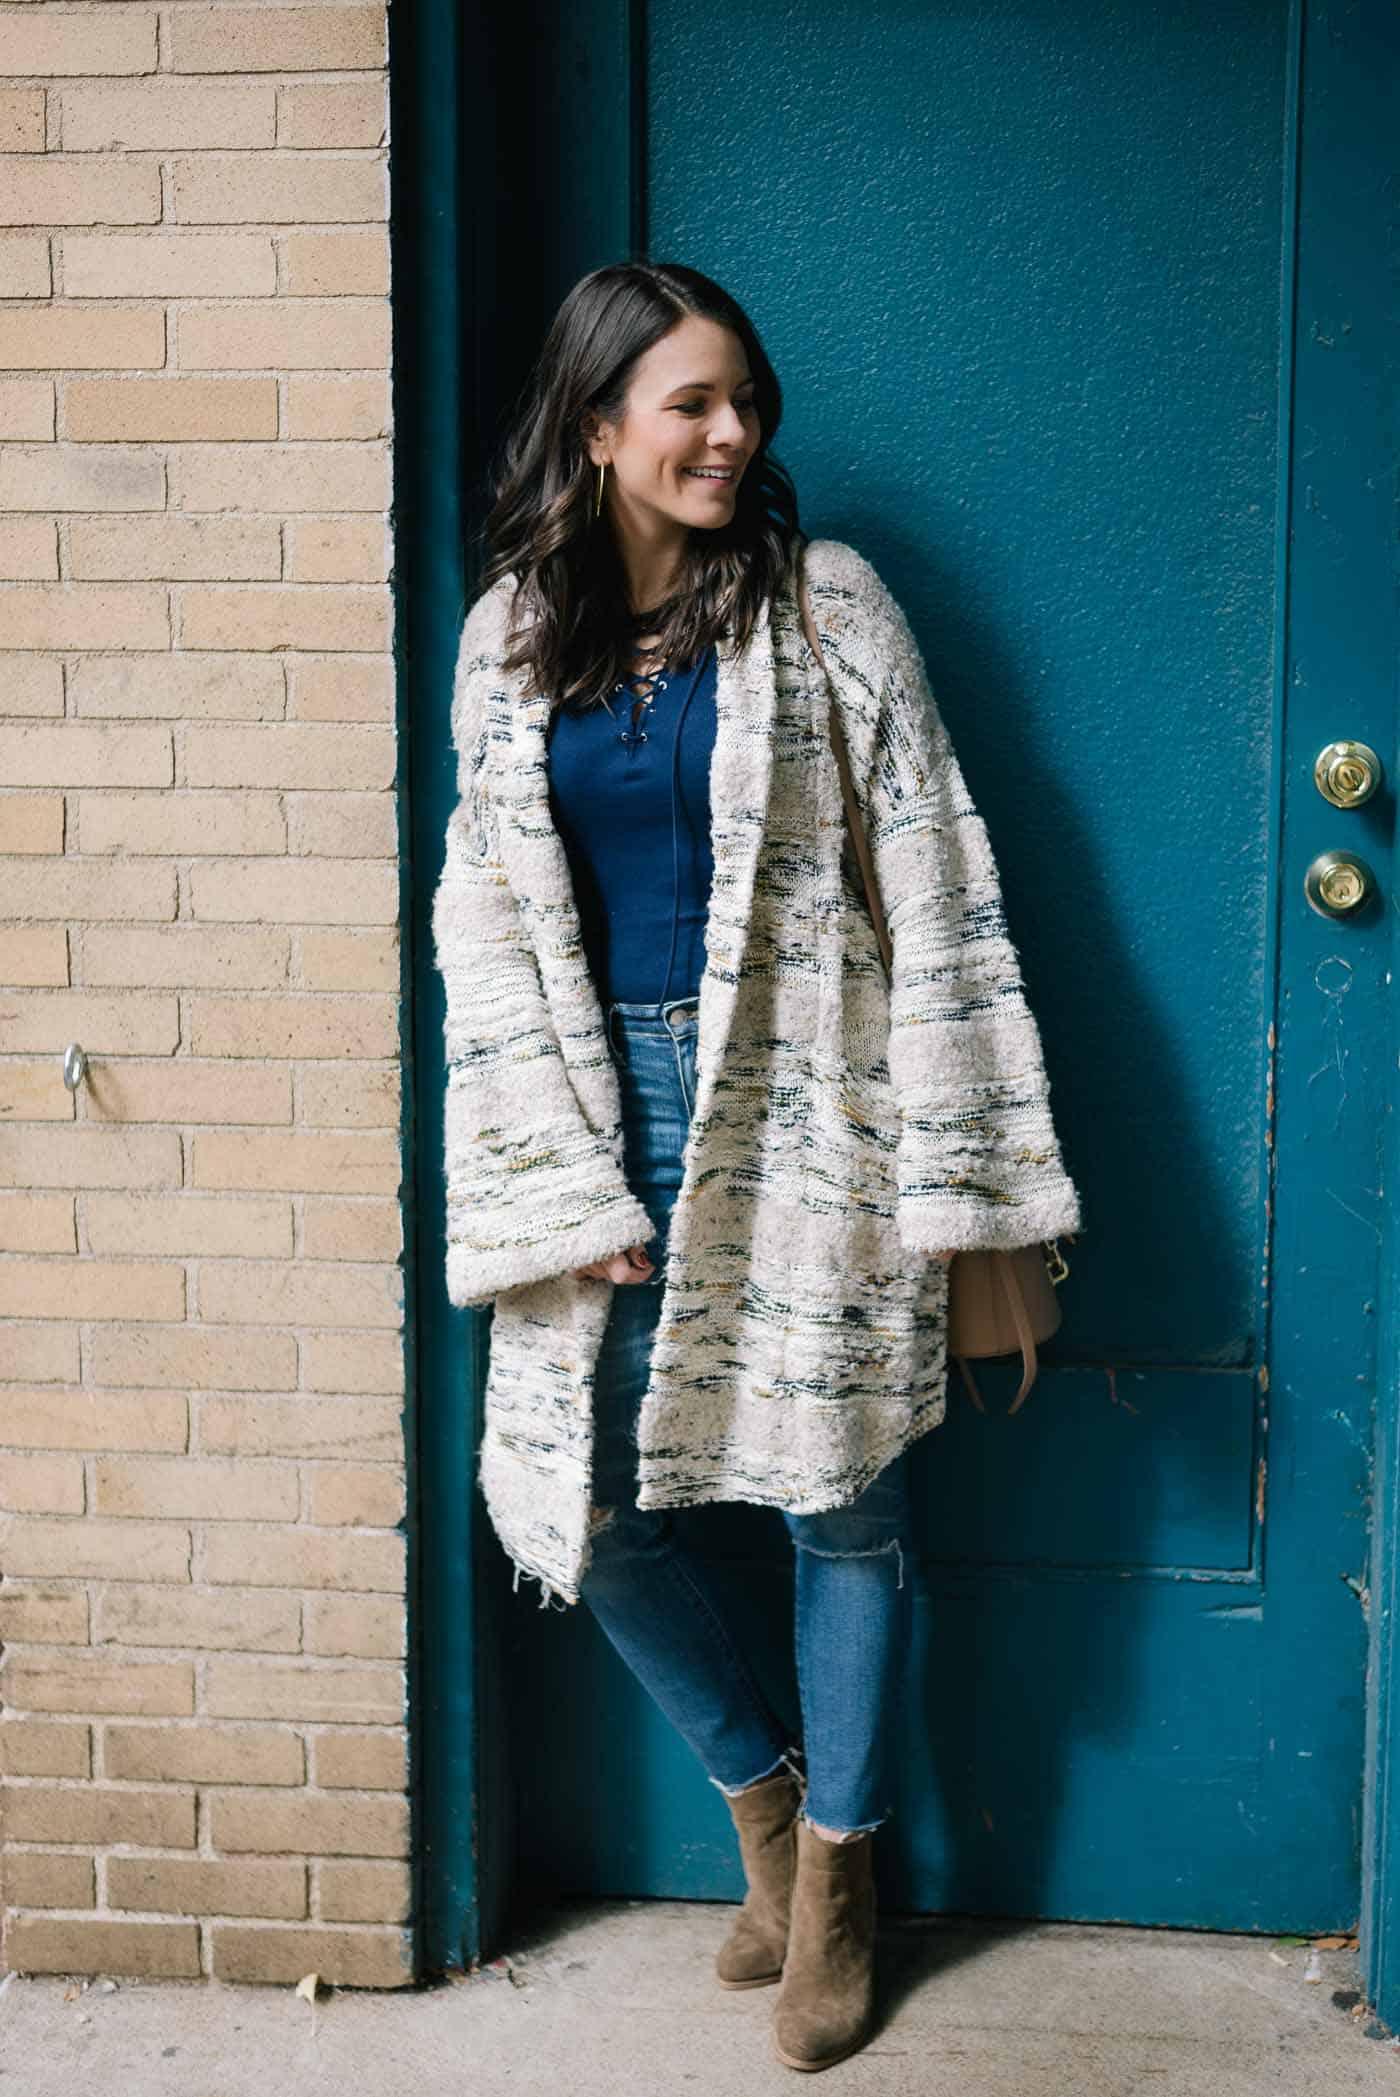 anthropologie cardigan, fall outfit ideas - My Style Vita @mystylevita